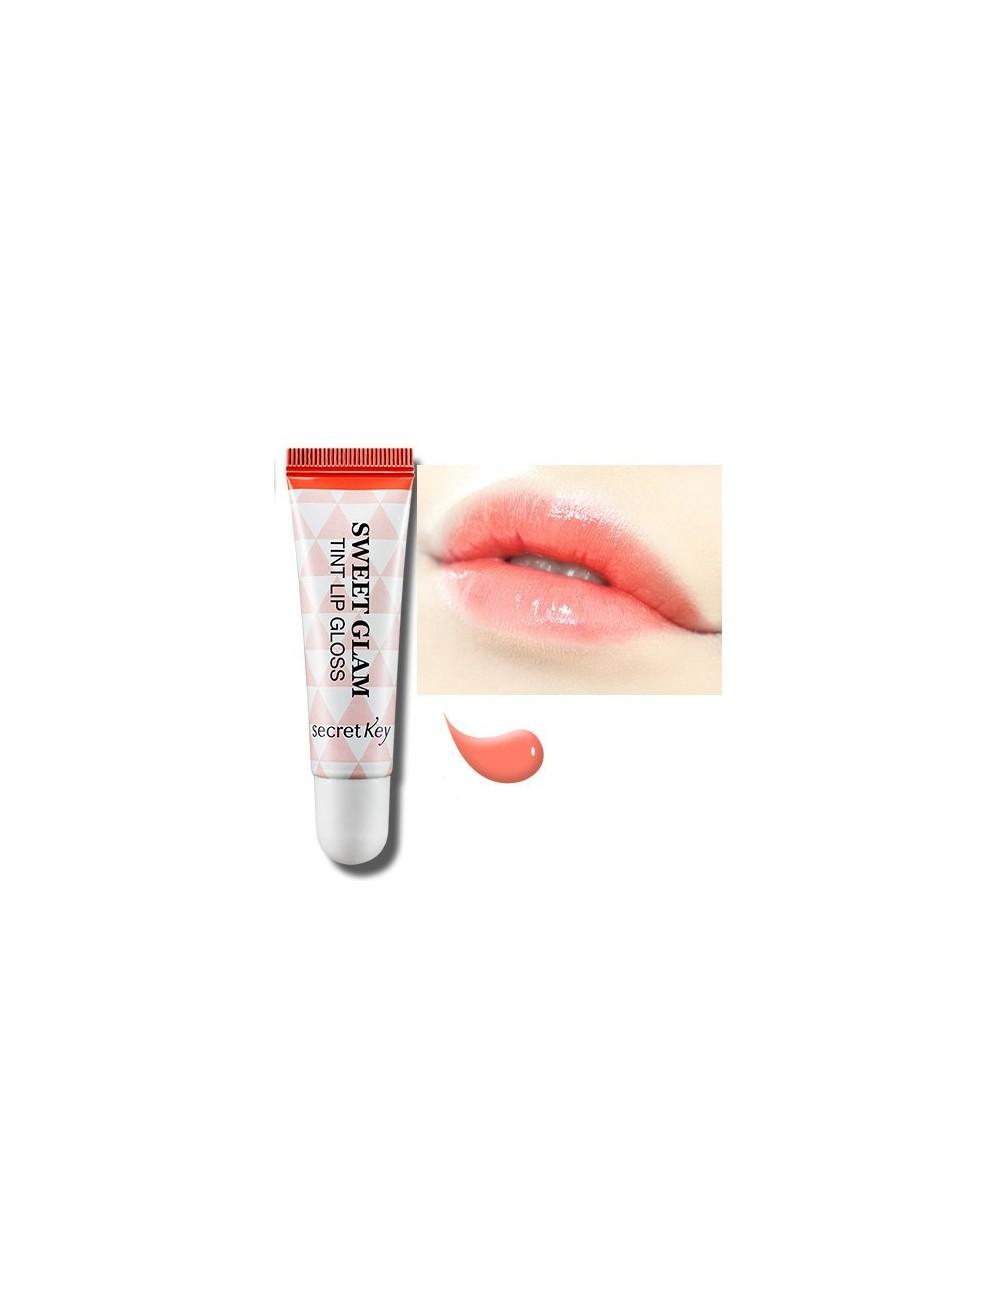 Gloss Hidratante para Labios Secret Key Sweet Glam Lip Tint Gloss Coral Peach